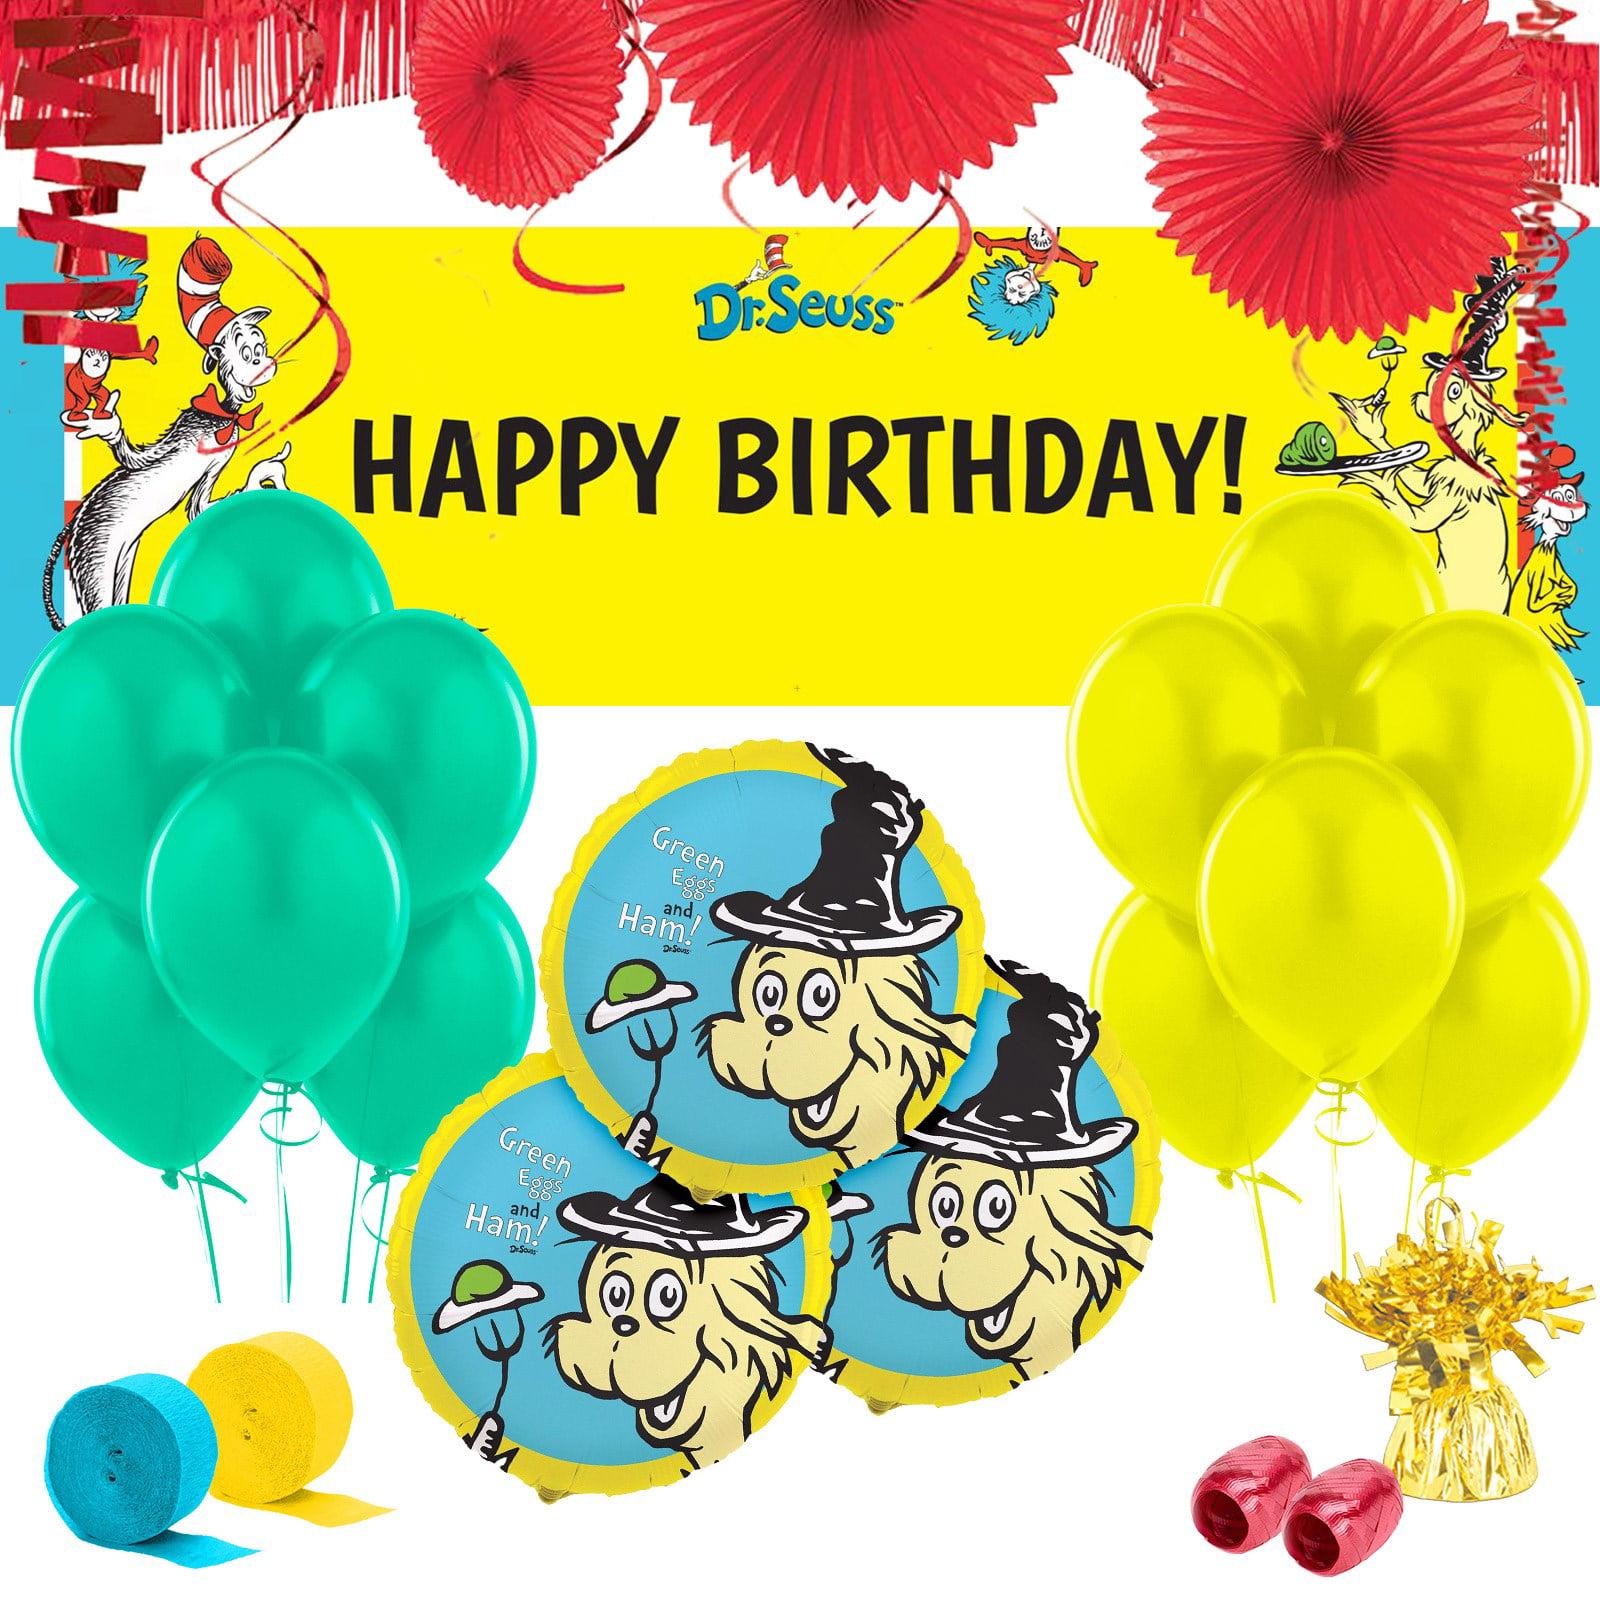 Dr. Seuss Classic Party Supplies - Walmart.com